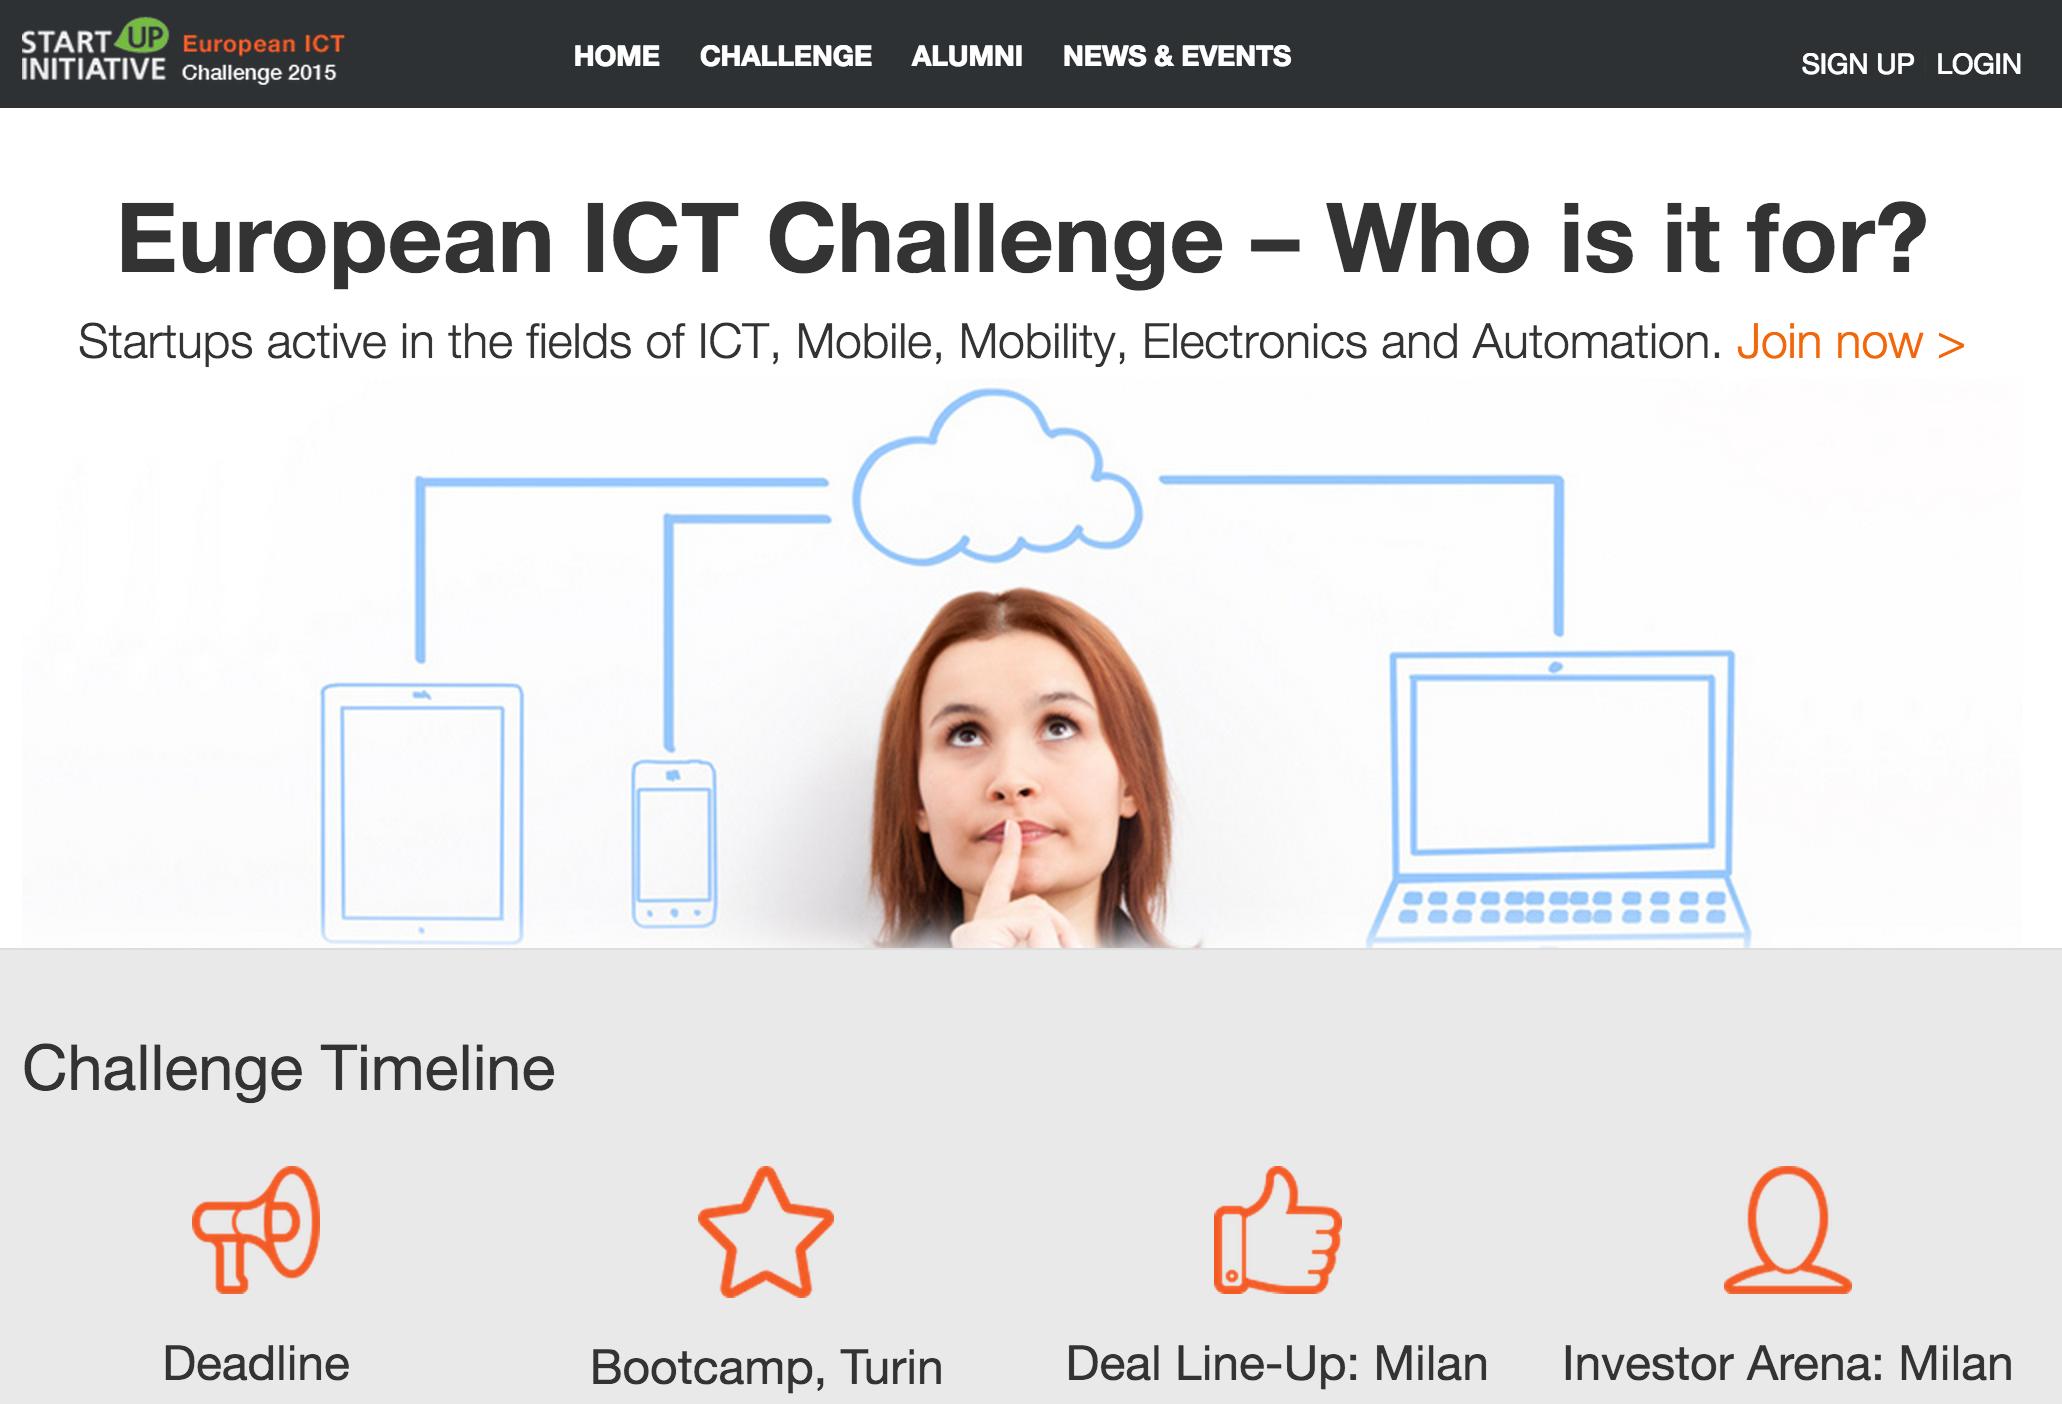 European ICT Challenge